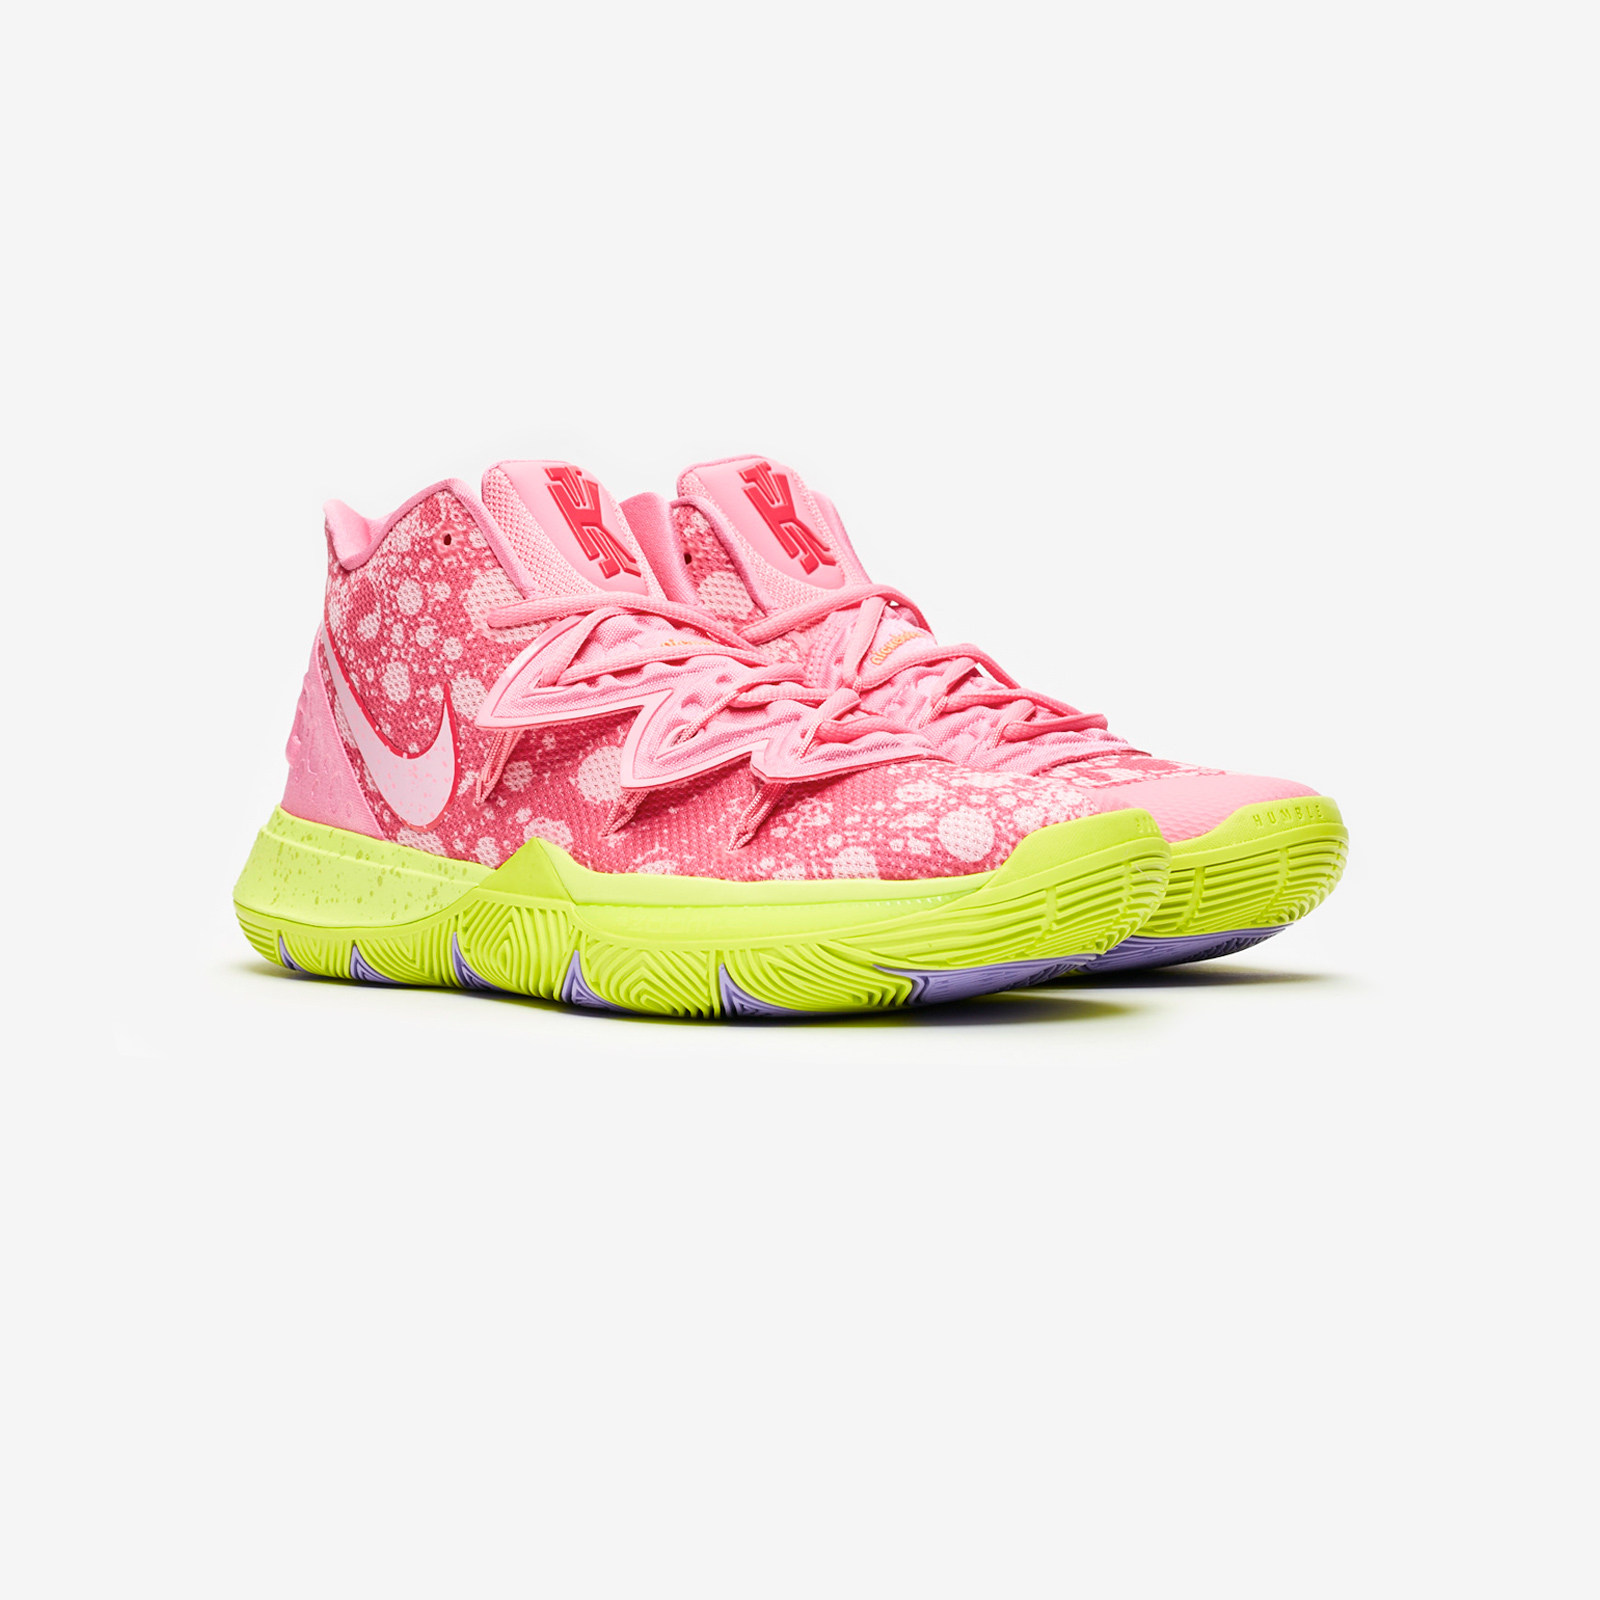 Nike Kyrie 5 SB - Cj6951-600